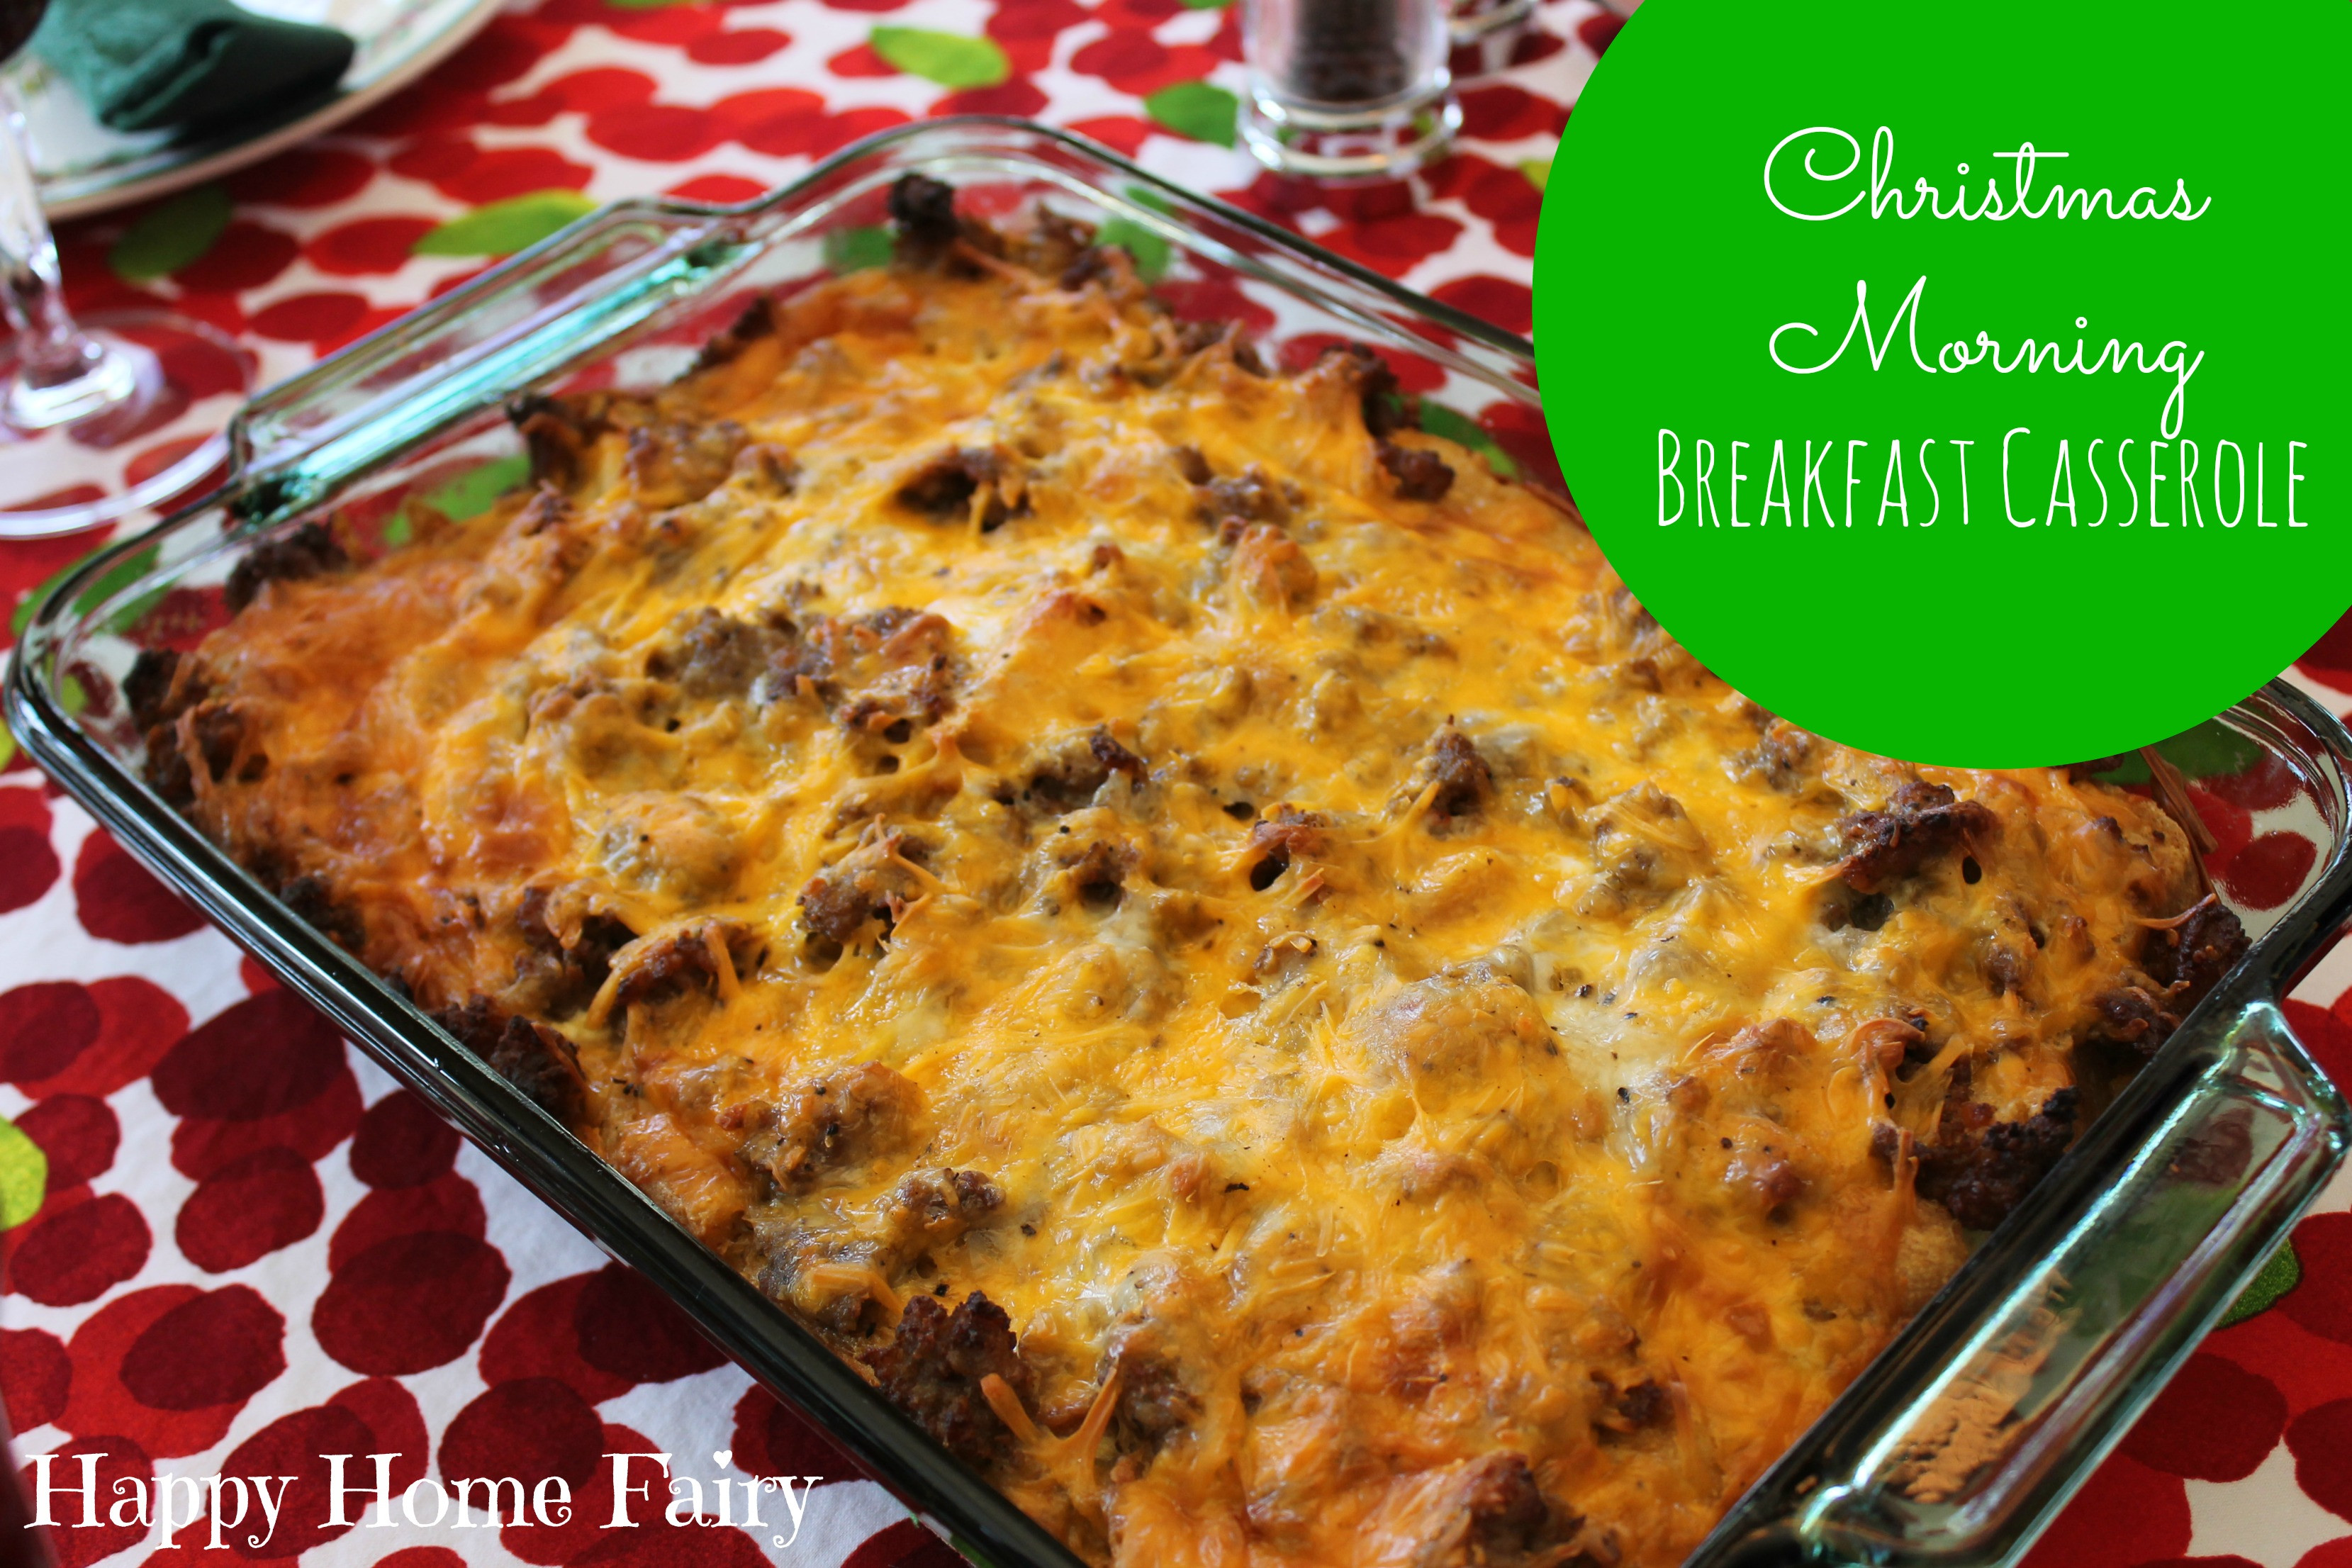 Easy Christmas Breakfast Casseroles  Recipe Christmas Morning Breakfast Casserole Happy